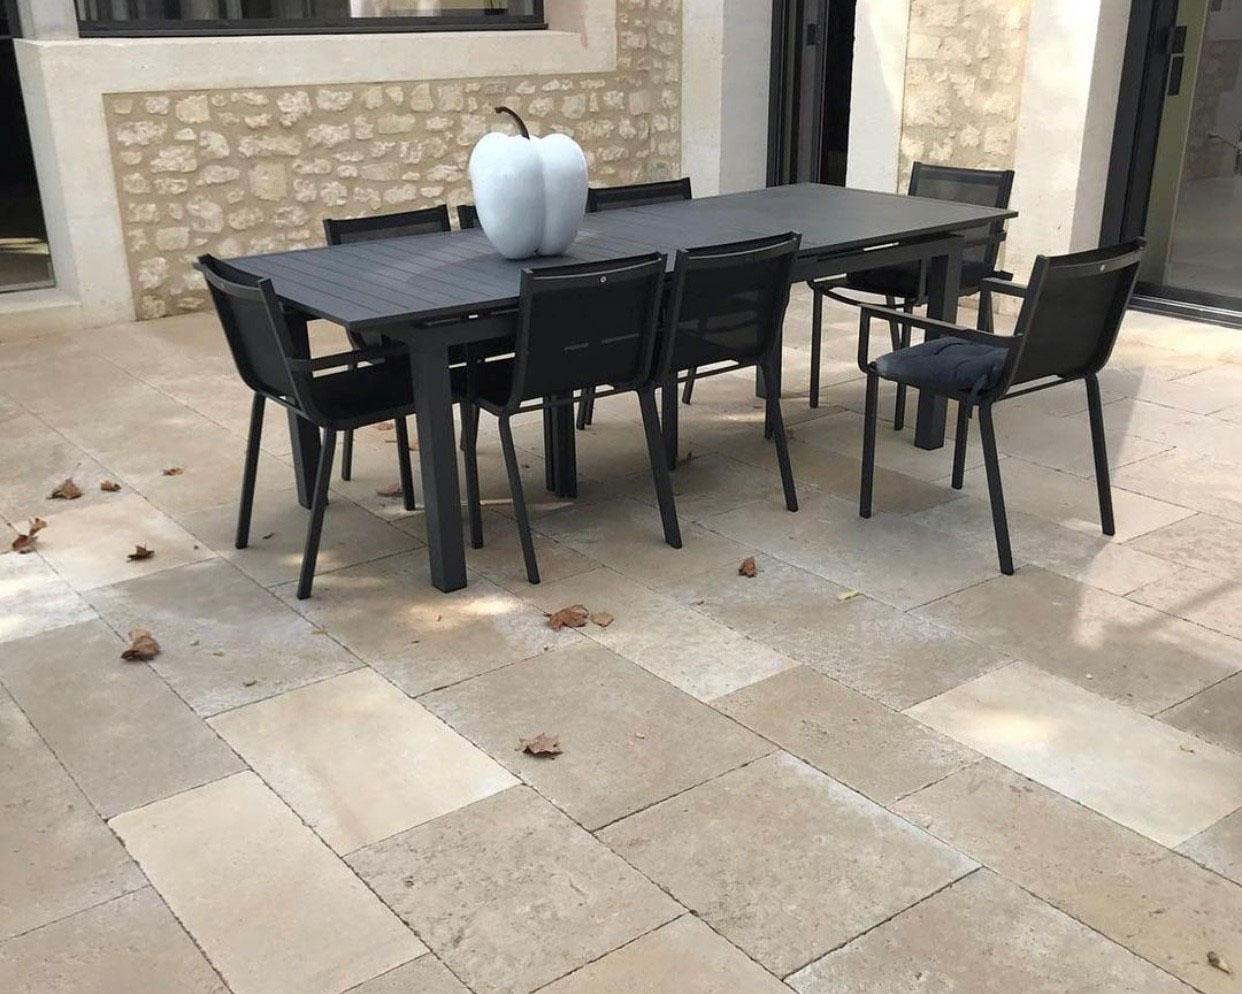 French limestone Clair - Jaune blend